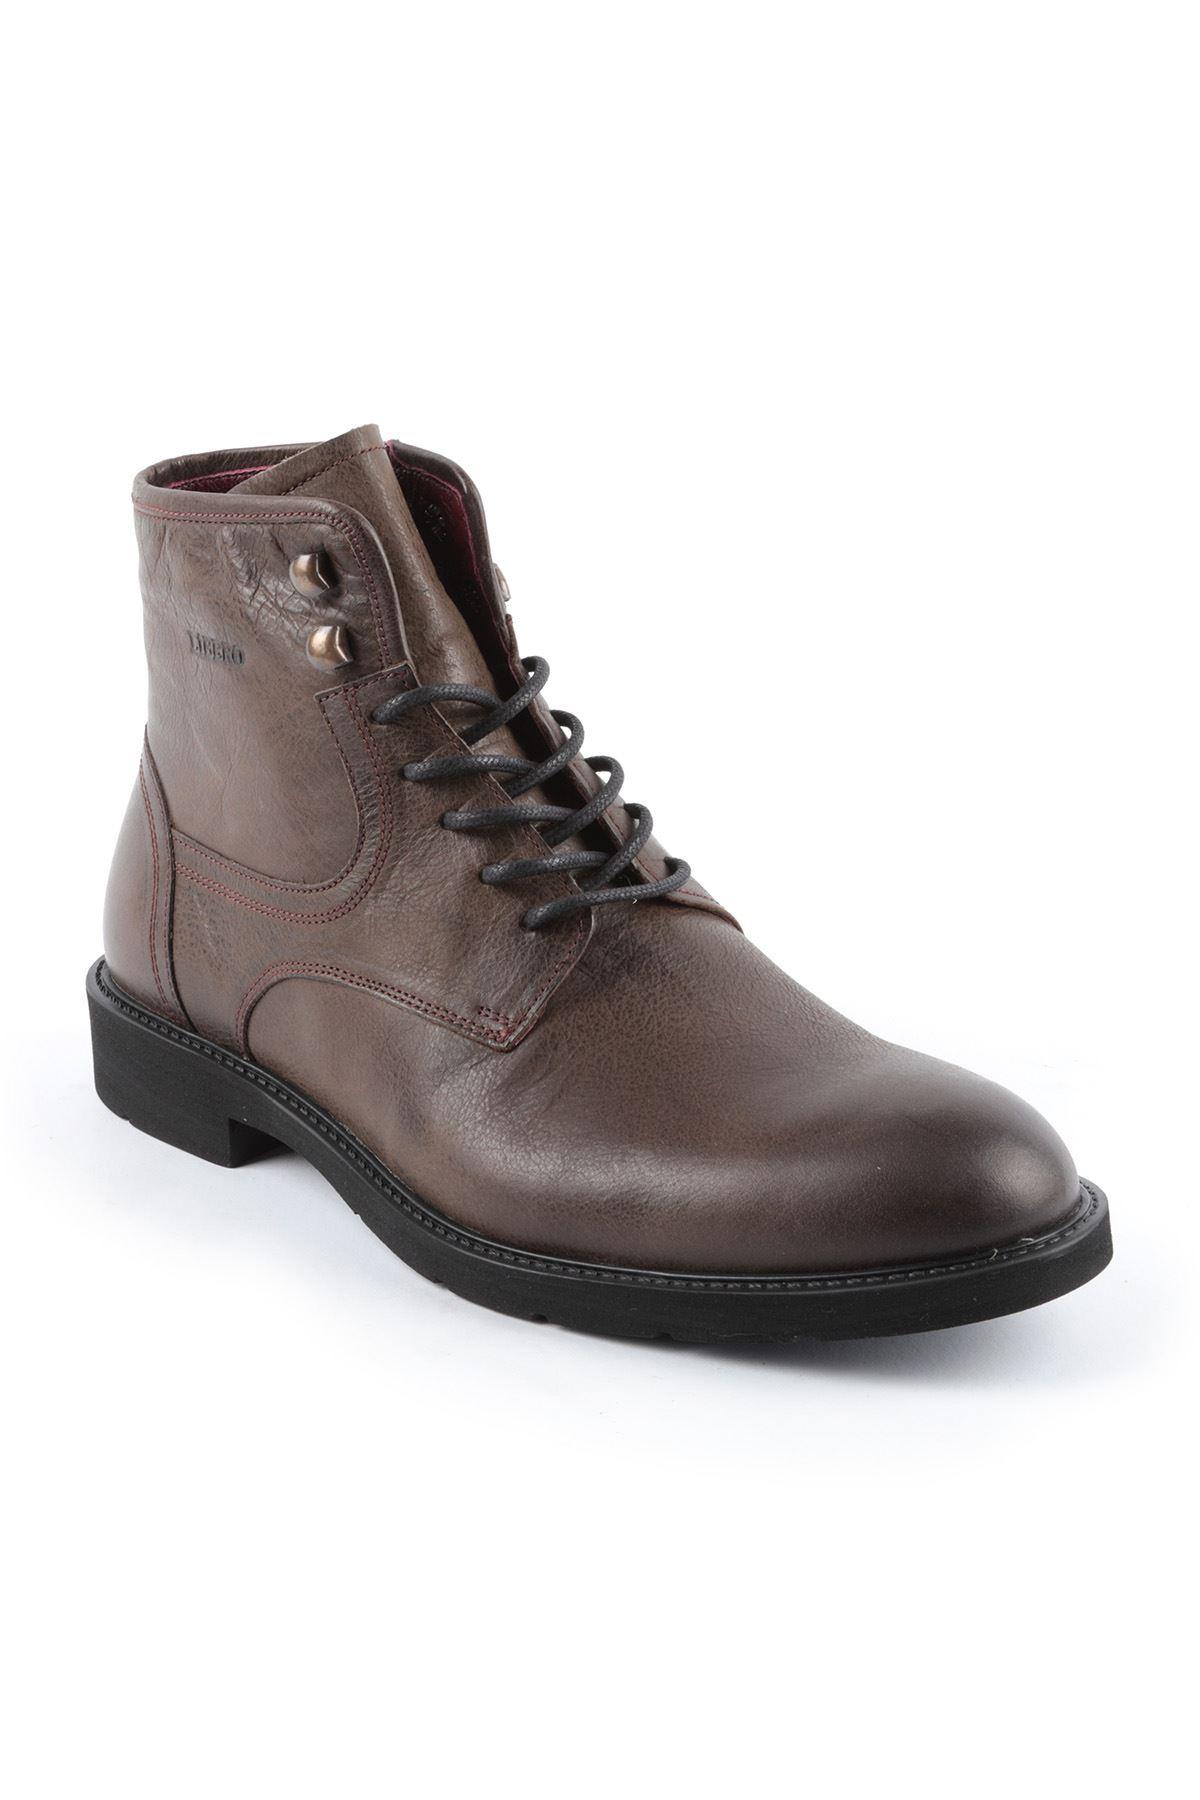 Libero L1315 Khaki Men's Boots